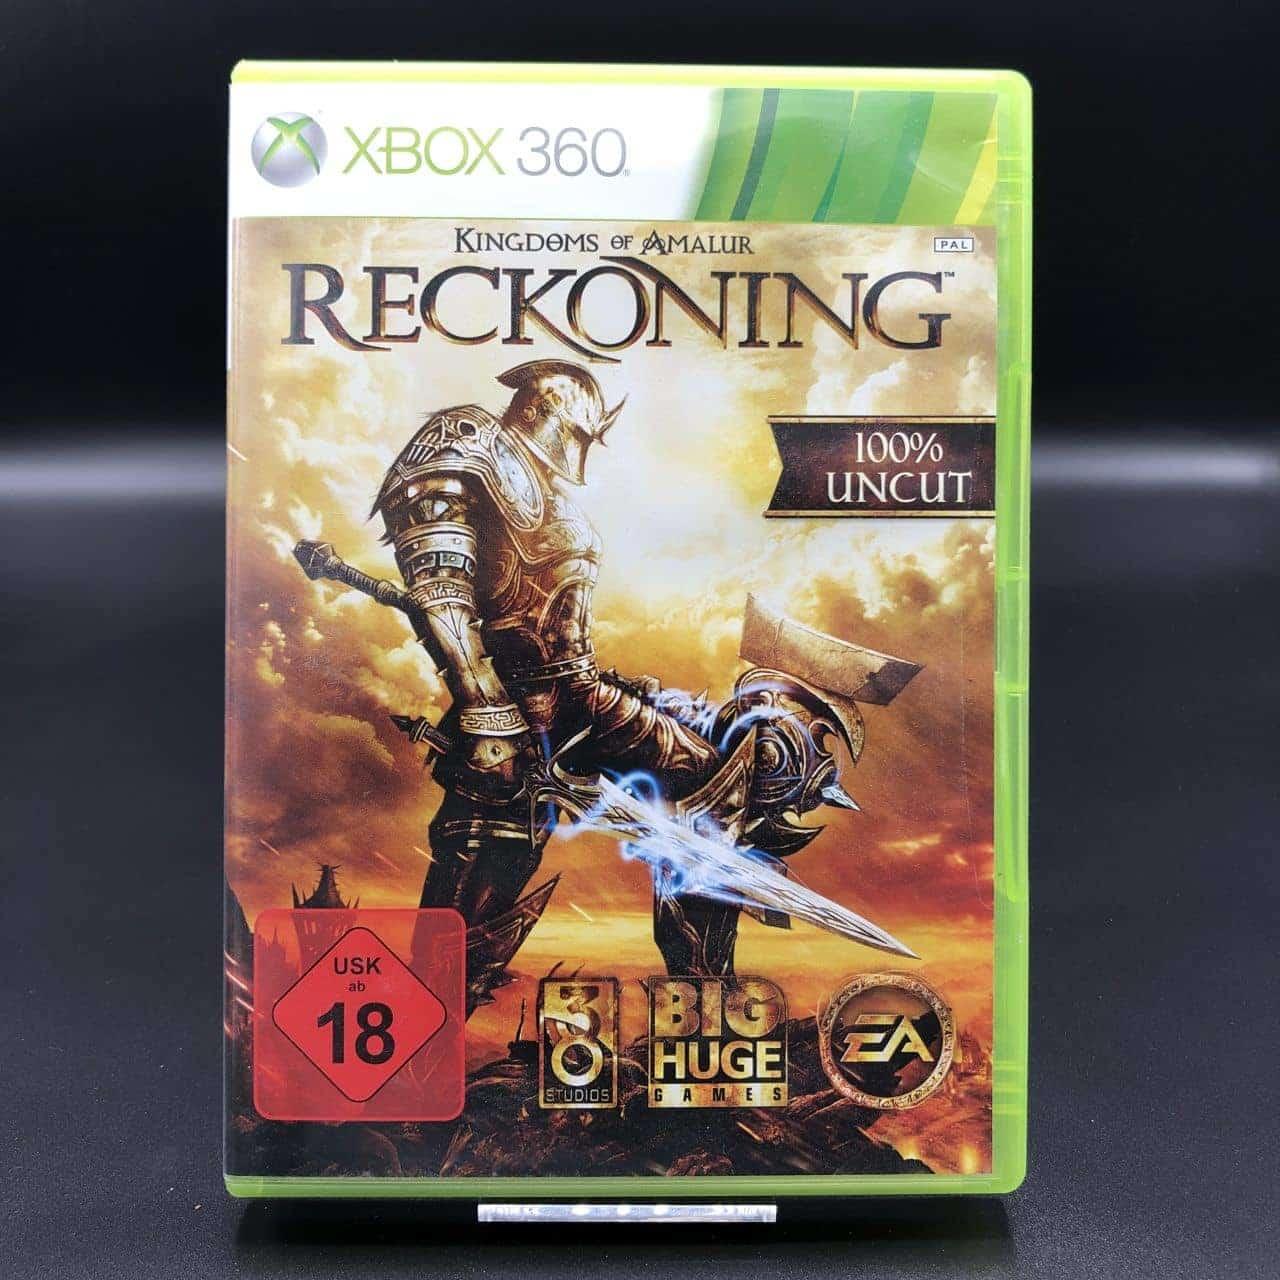 Kingdoms of Amalur: Reckoning (ohne Anleitung) (Gut) XBOX 360 (FSK18)